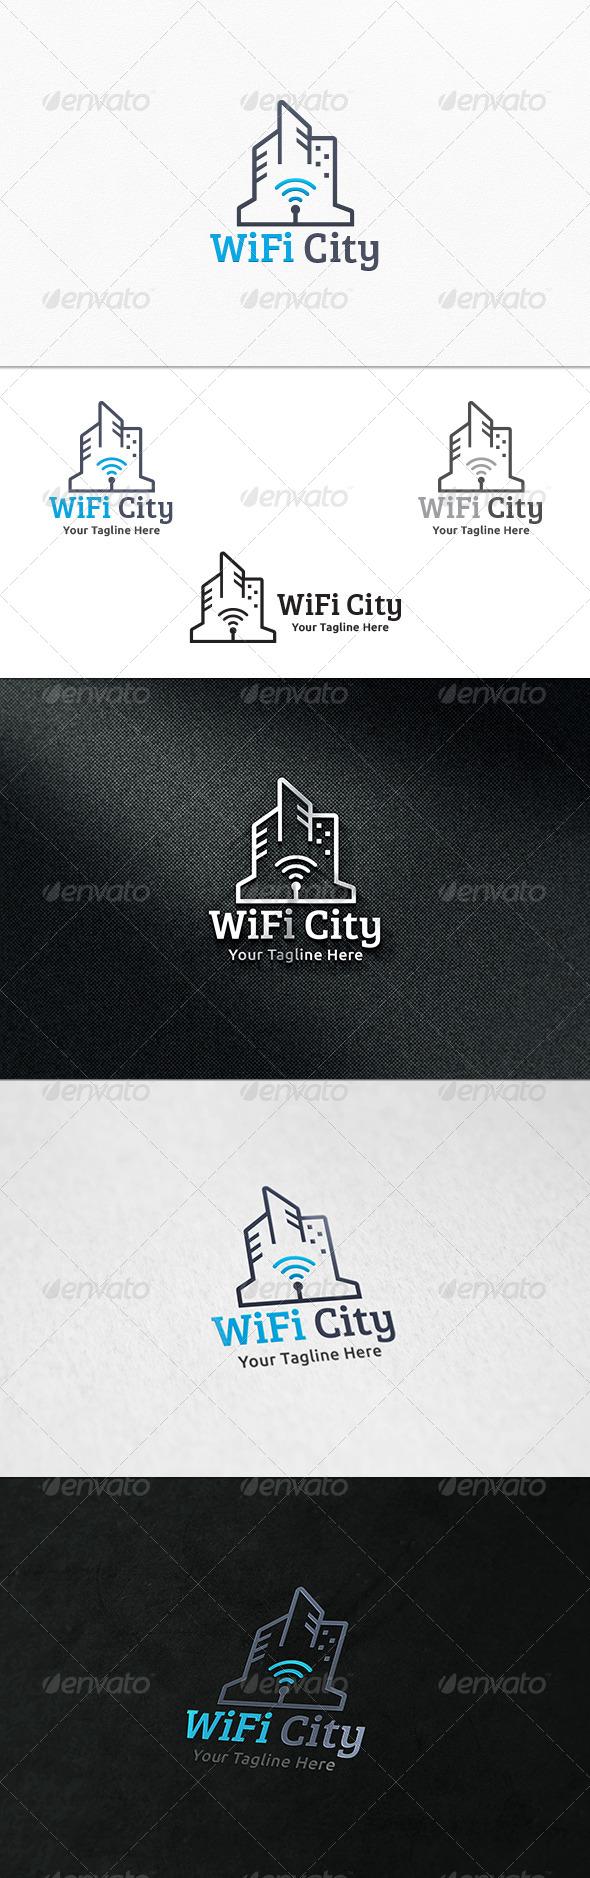 WiFi City - Logo Template - Buildings Logo Templates